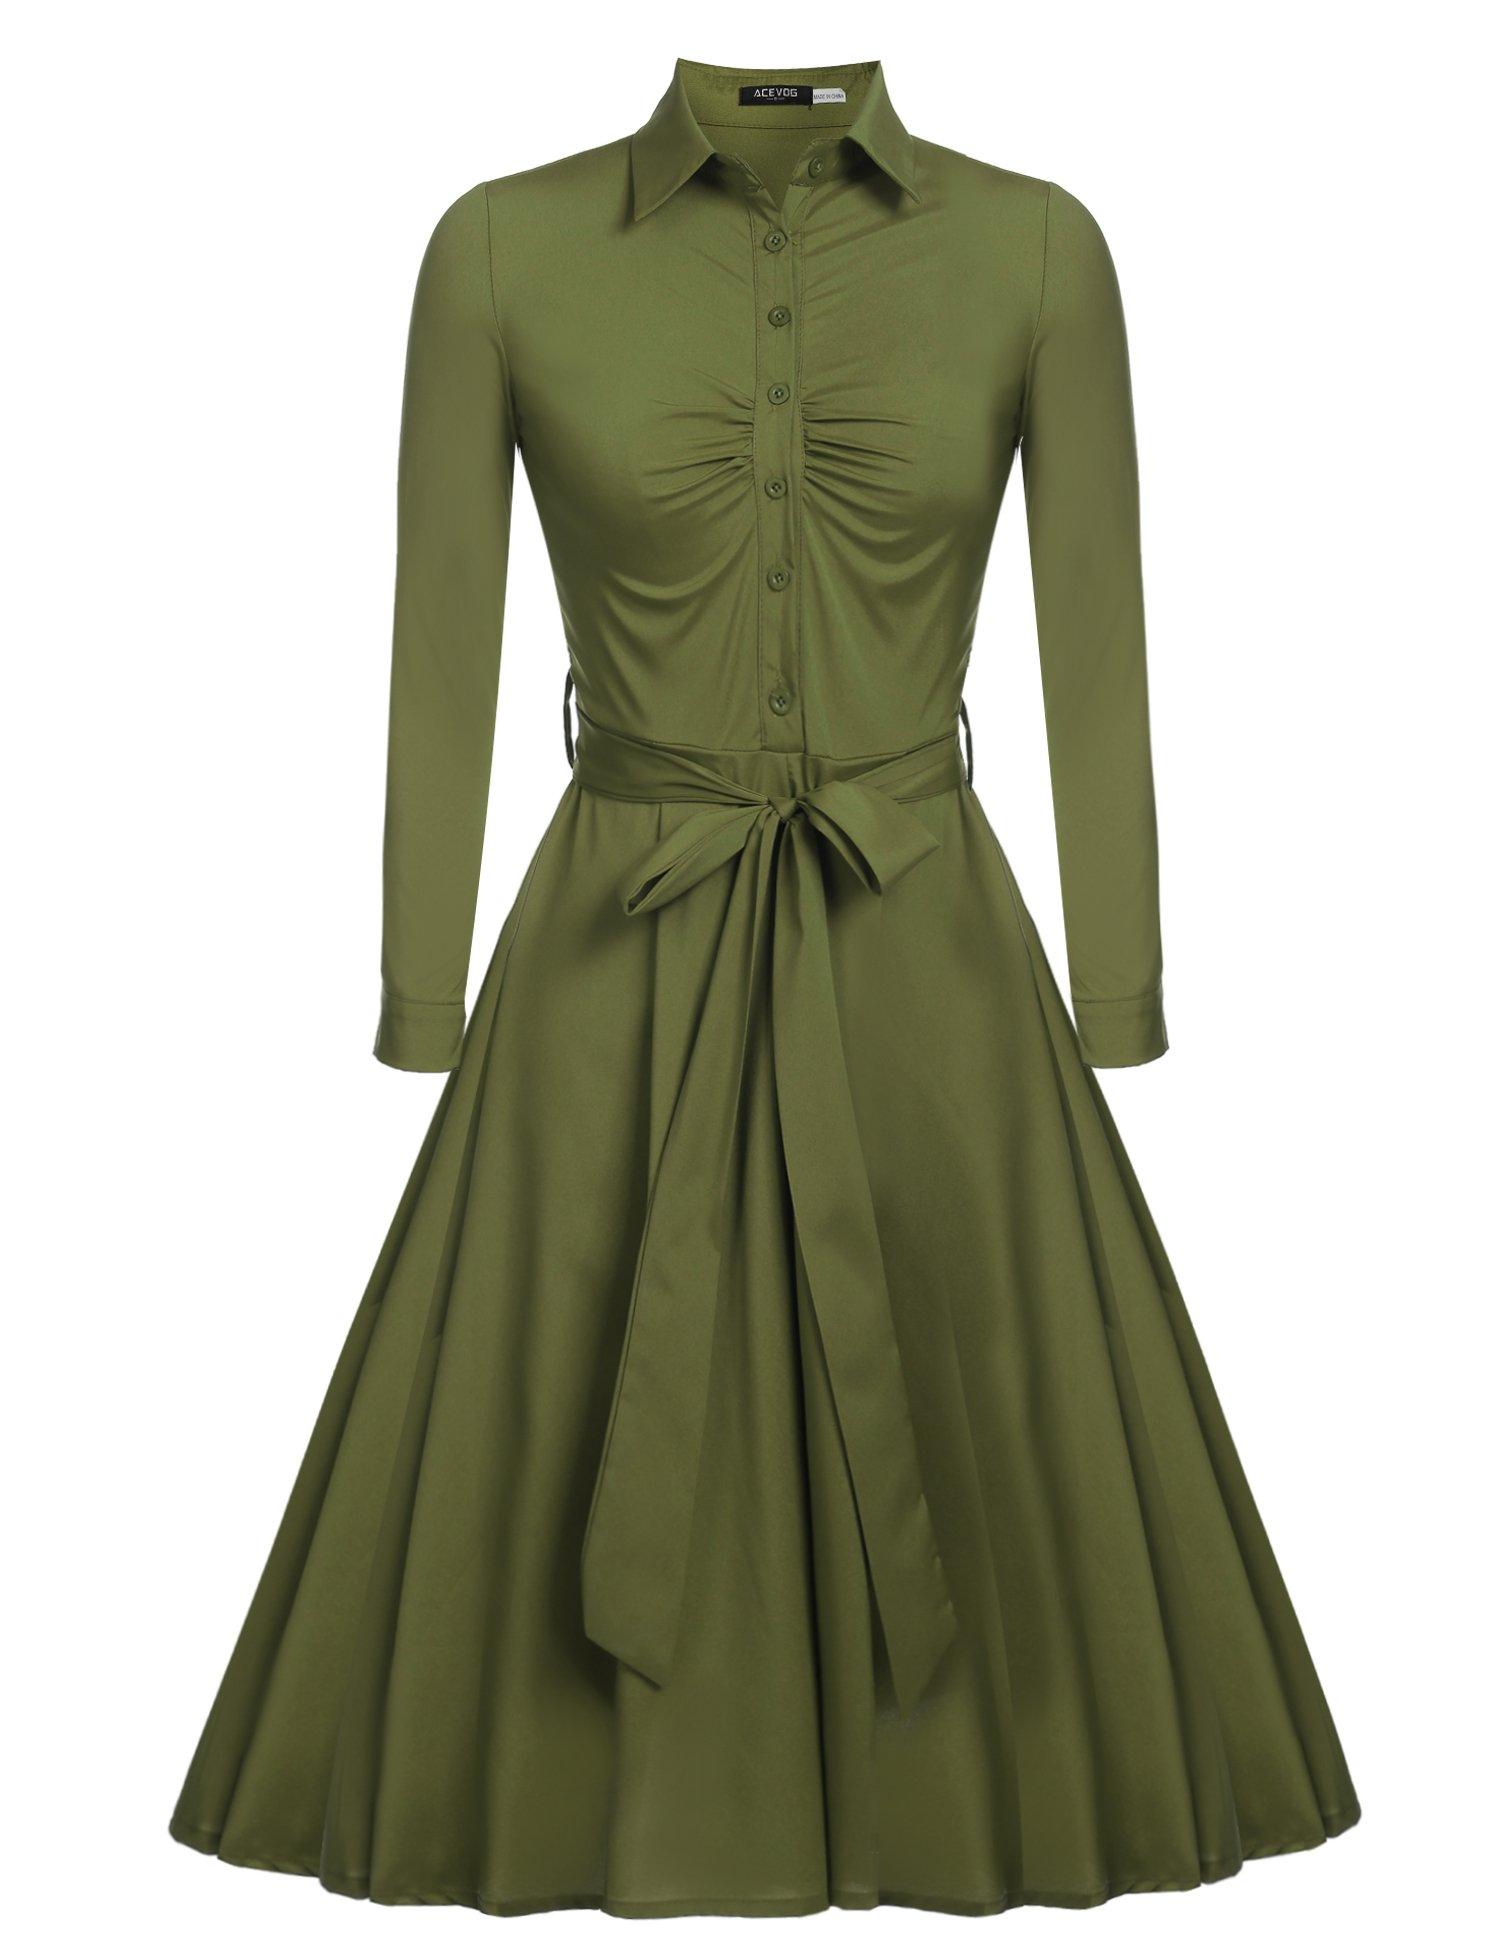 Beyove Womens Long Sleeves 1950s Vintage Swing Stretchy Dresses Army Green M